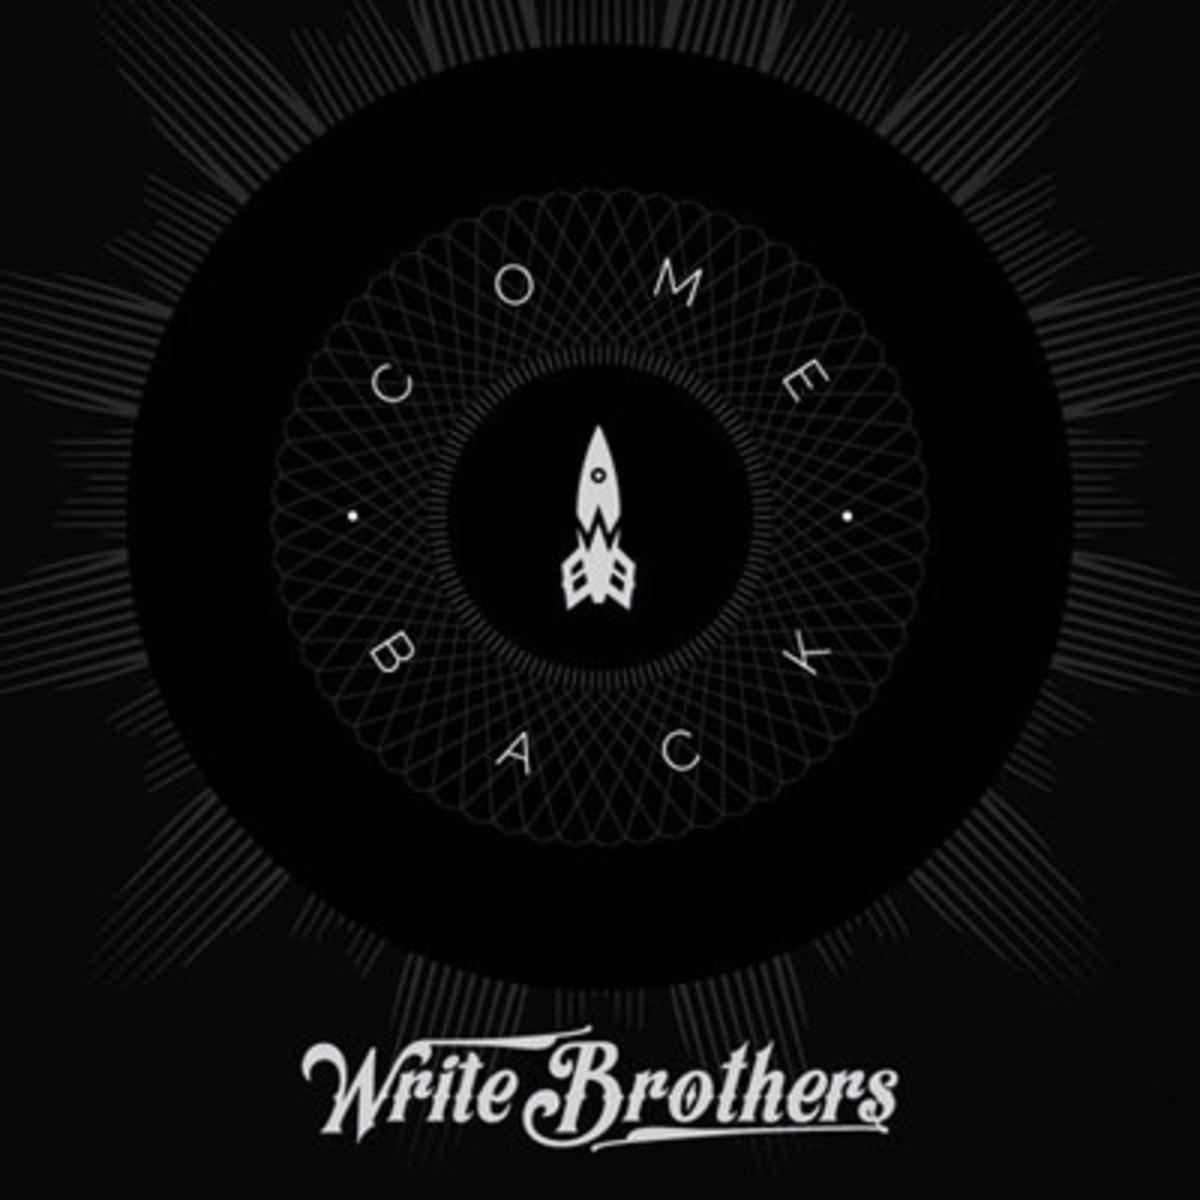 writebrothers-comeback.jpg